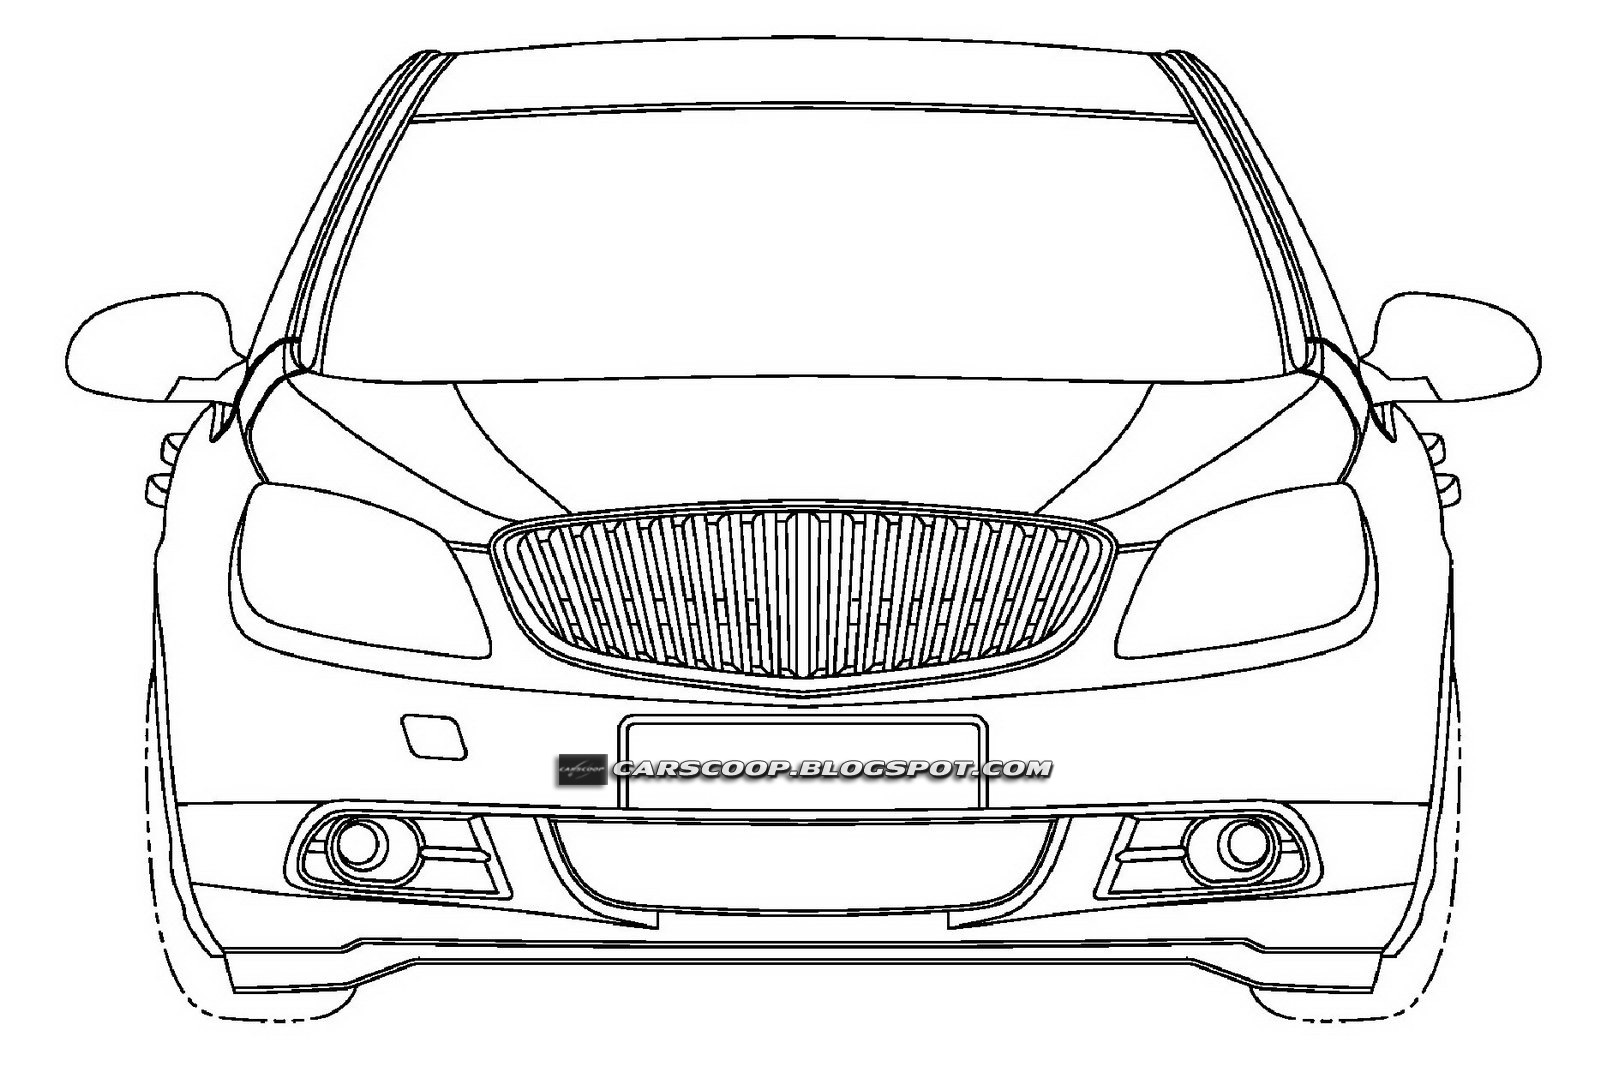 U S Patent Drawings Of Buick Excelle Sedan